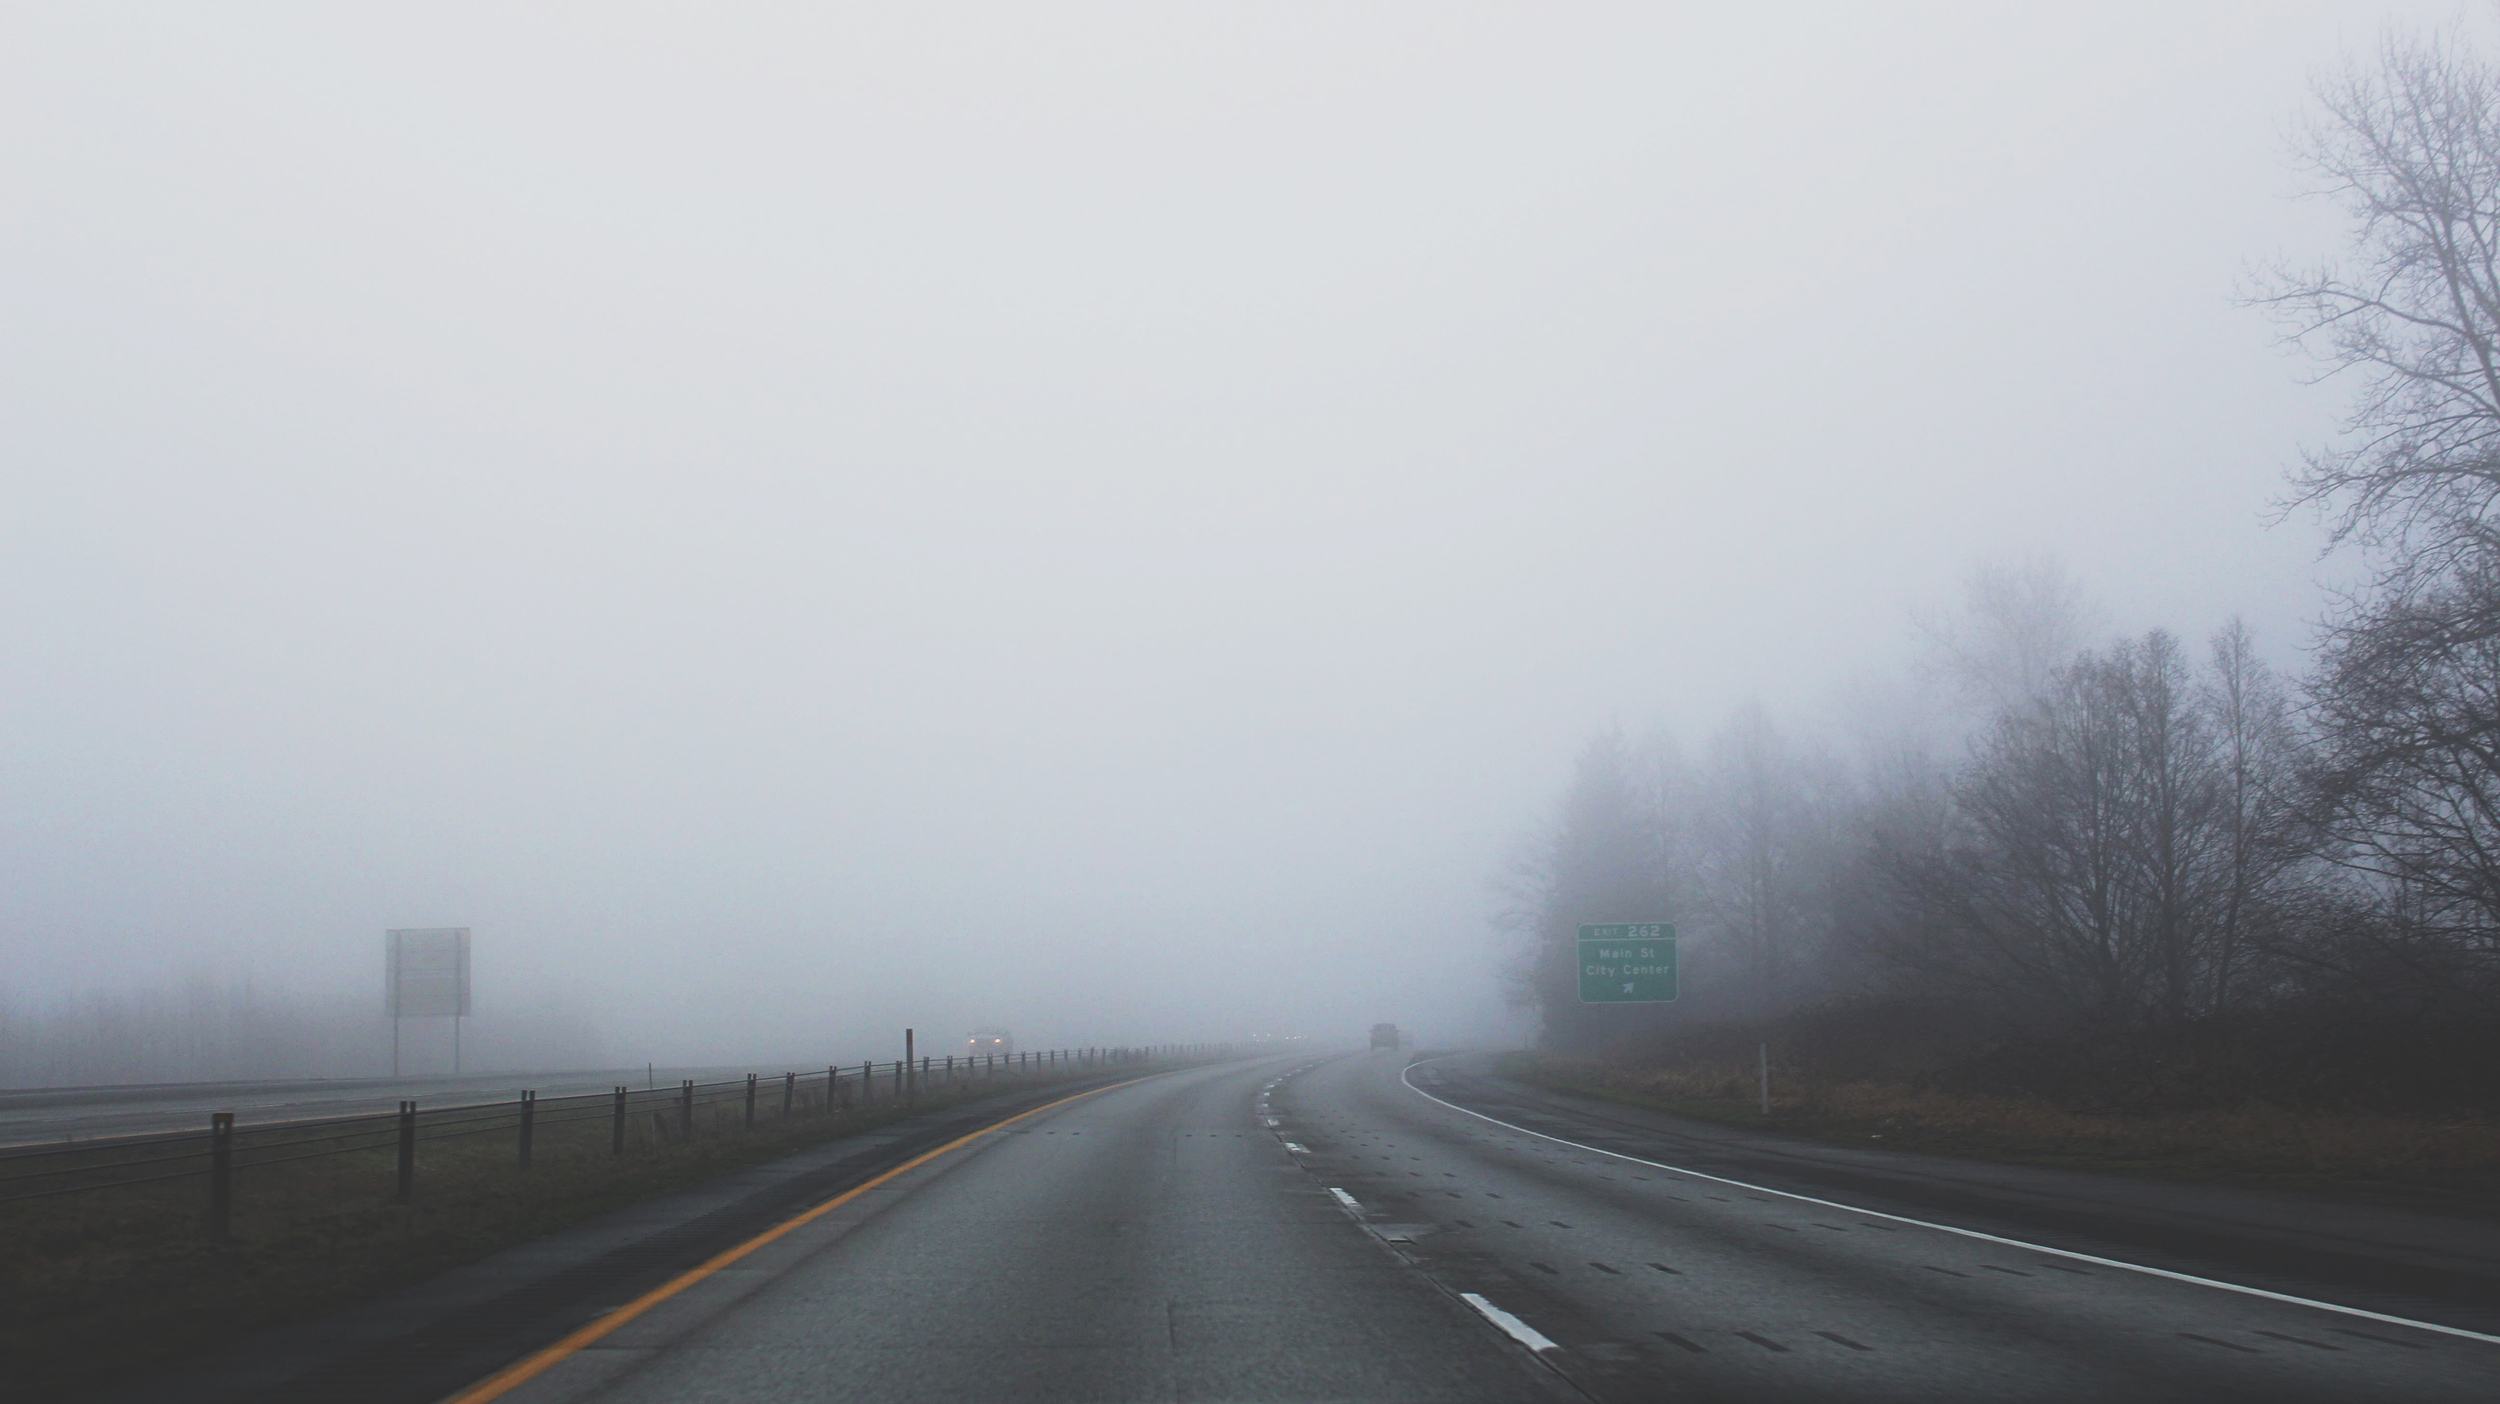 Misty Freeway